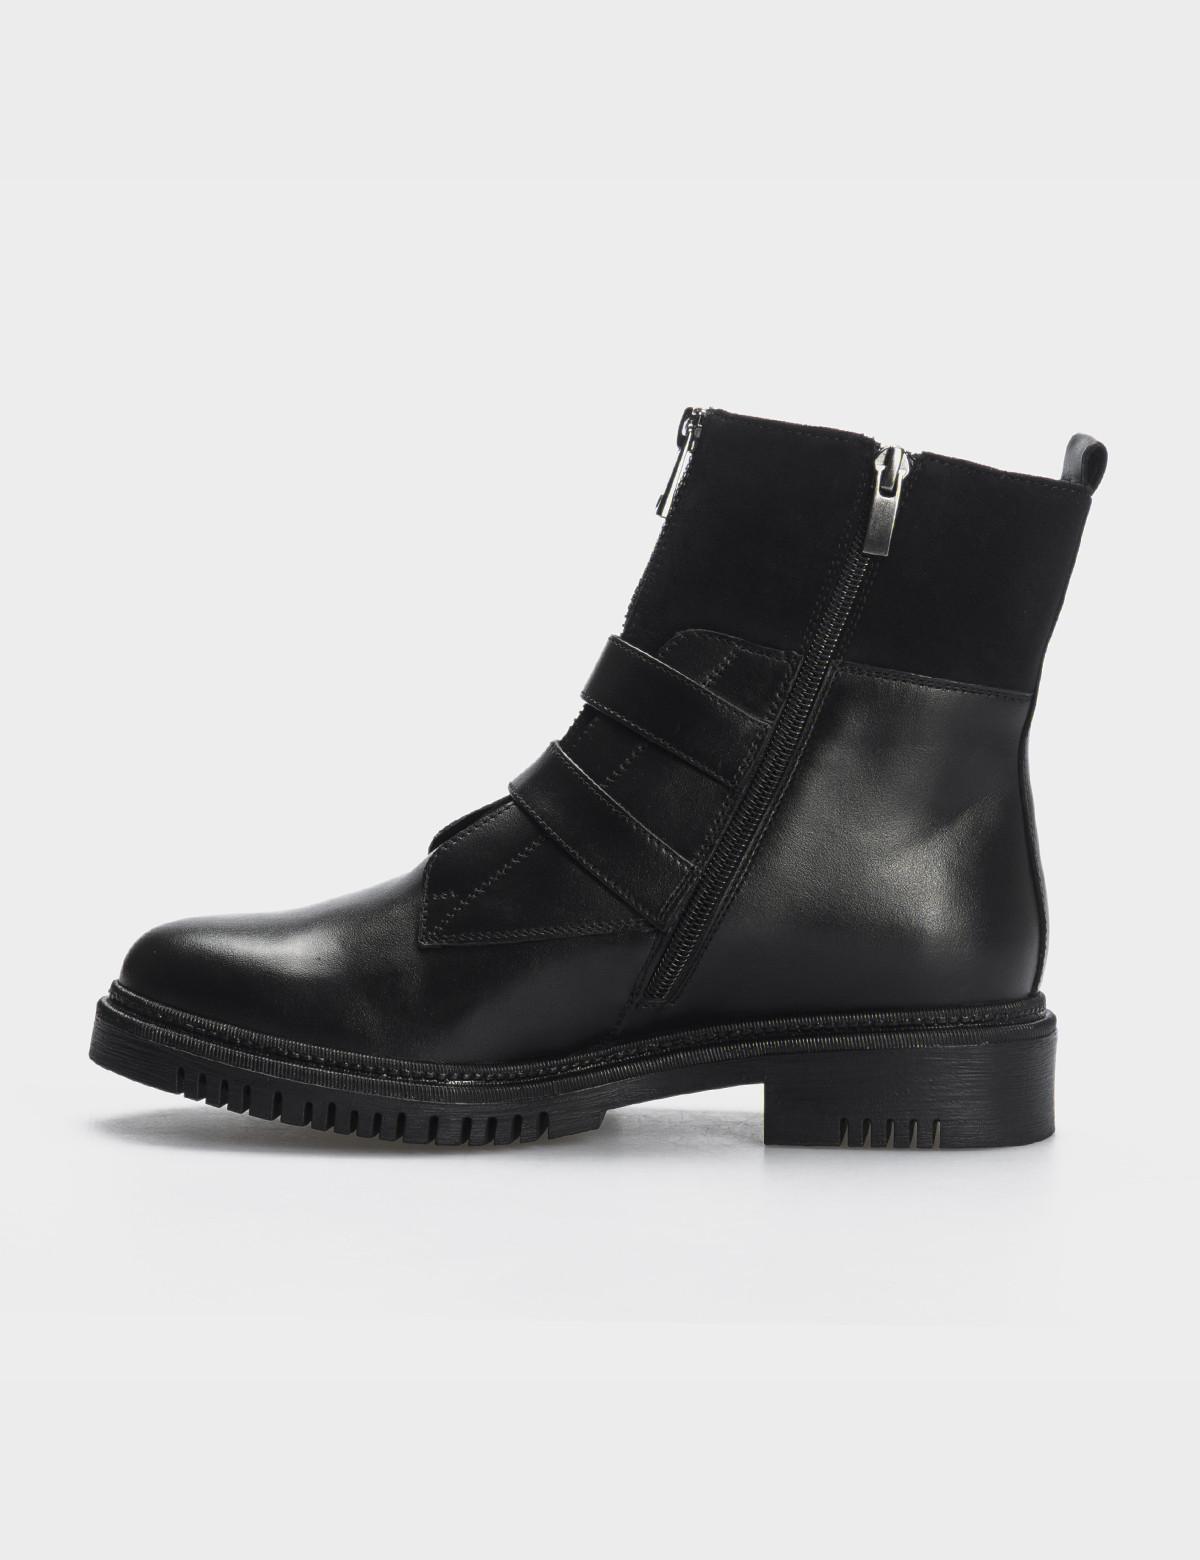 Ботинки, натуральная кожа/замша. Байка3